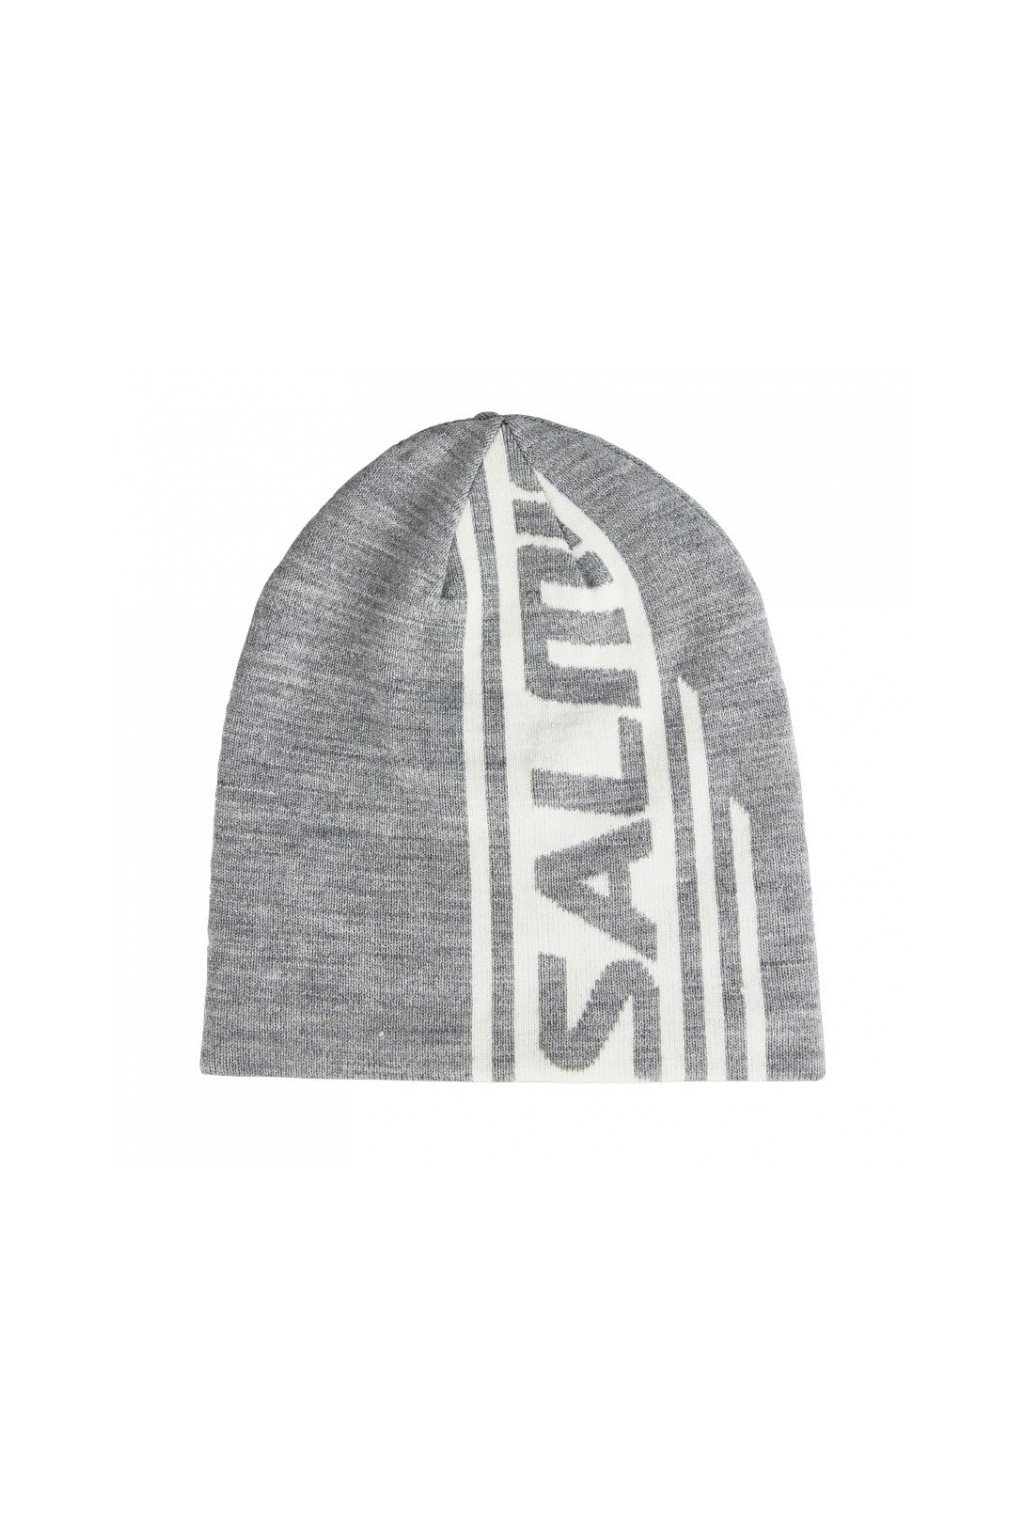 salming logo beanie 20 grey melange